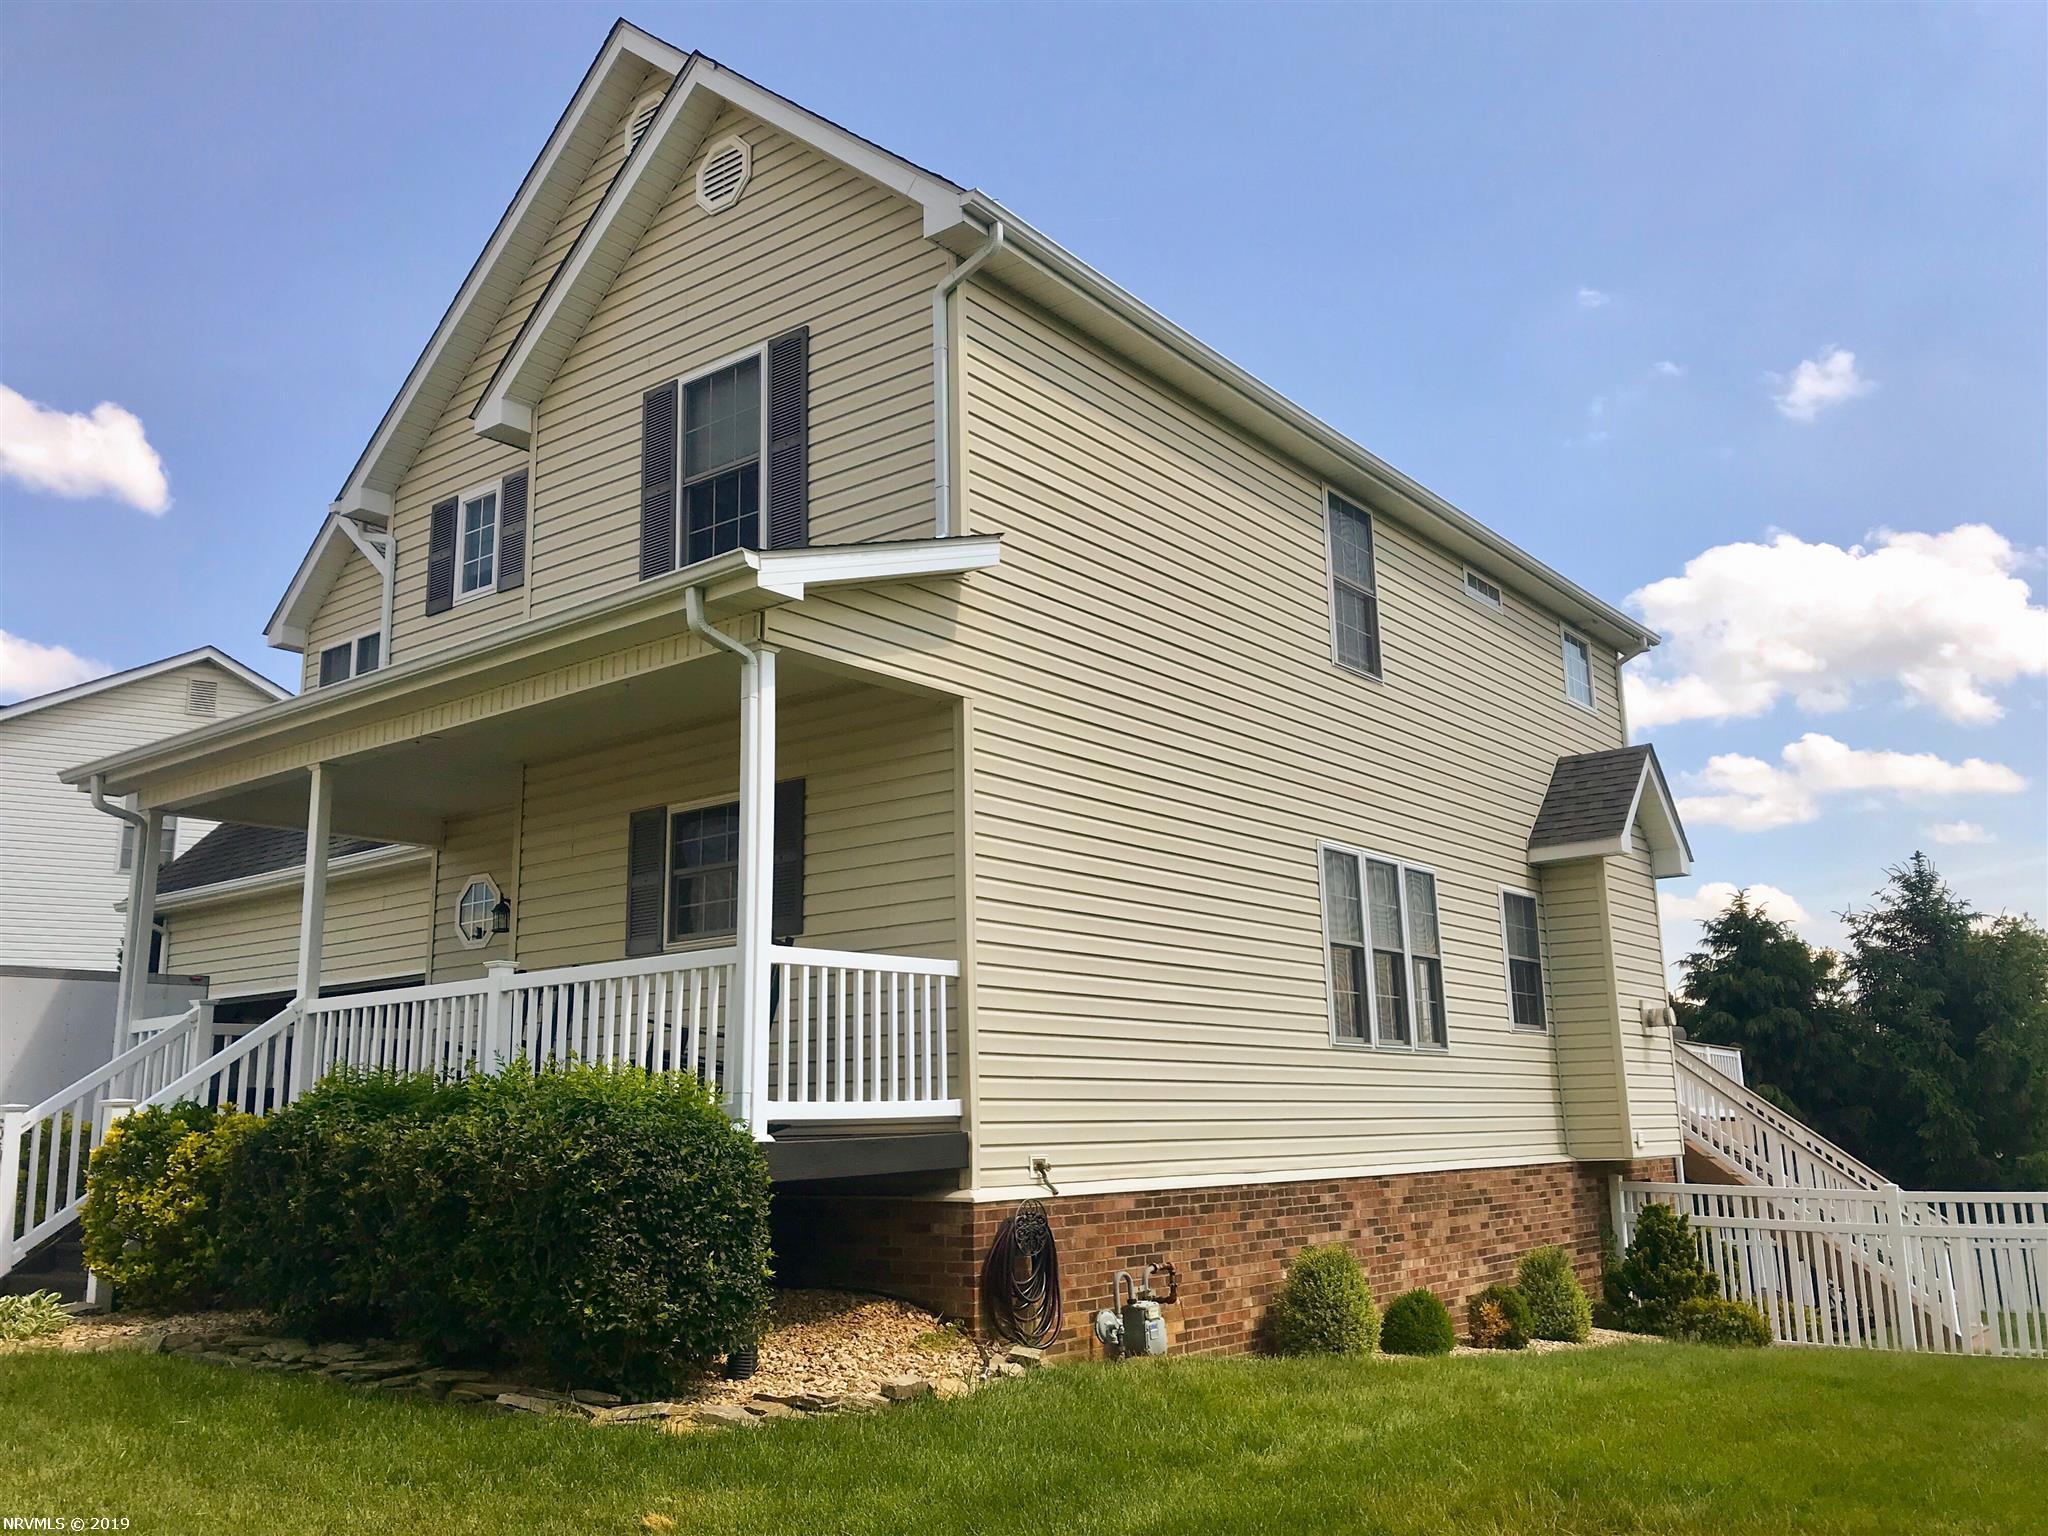 Single Family for Sale at 60 Katie Lane Street 60 Katie Lane Street Christiansburg, Virginia 24073 United States